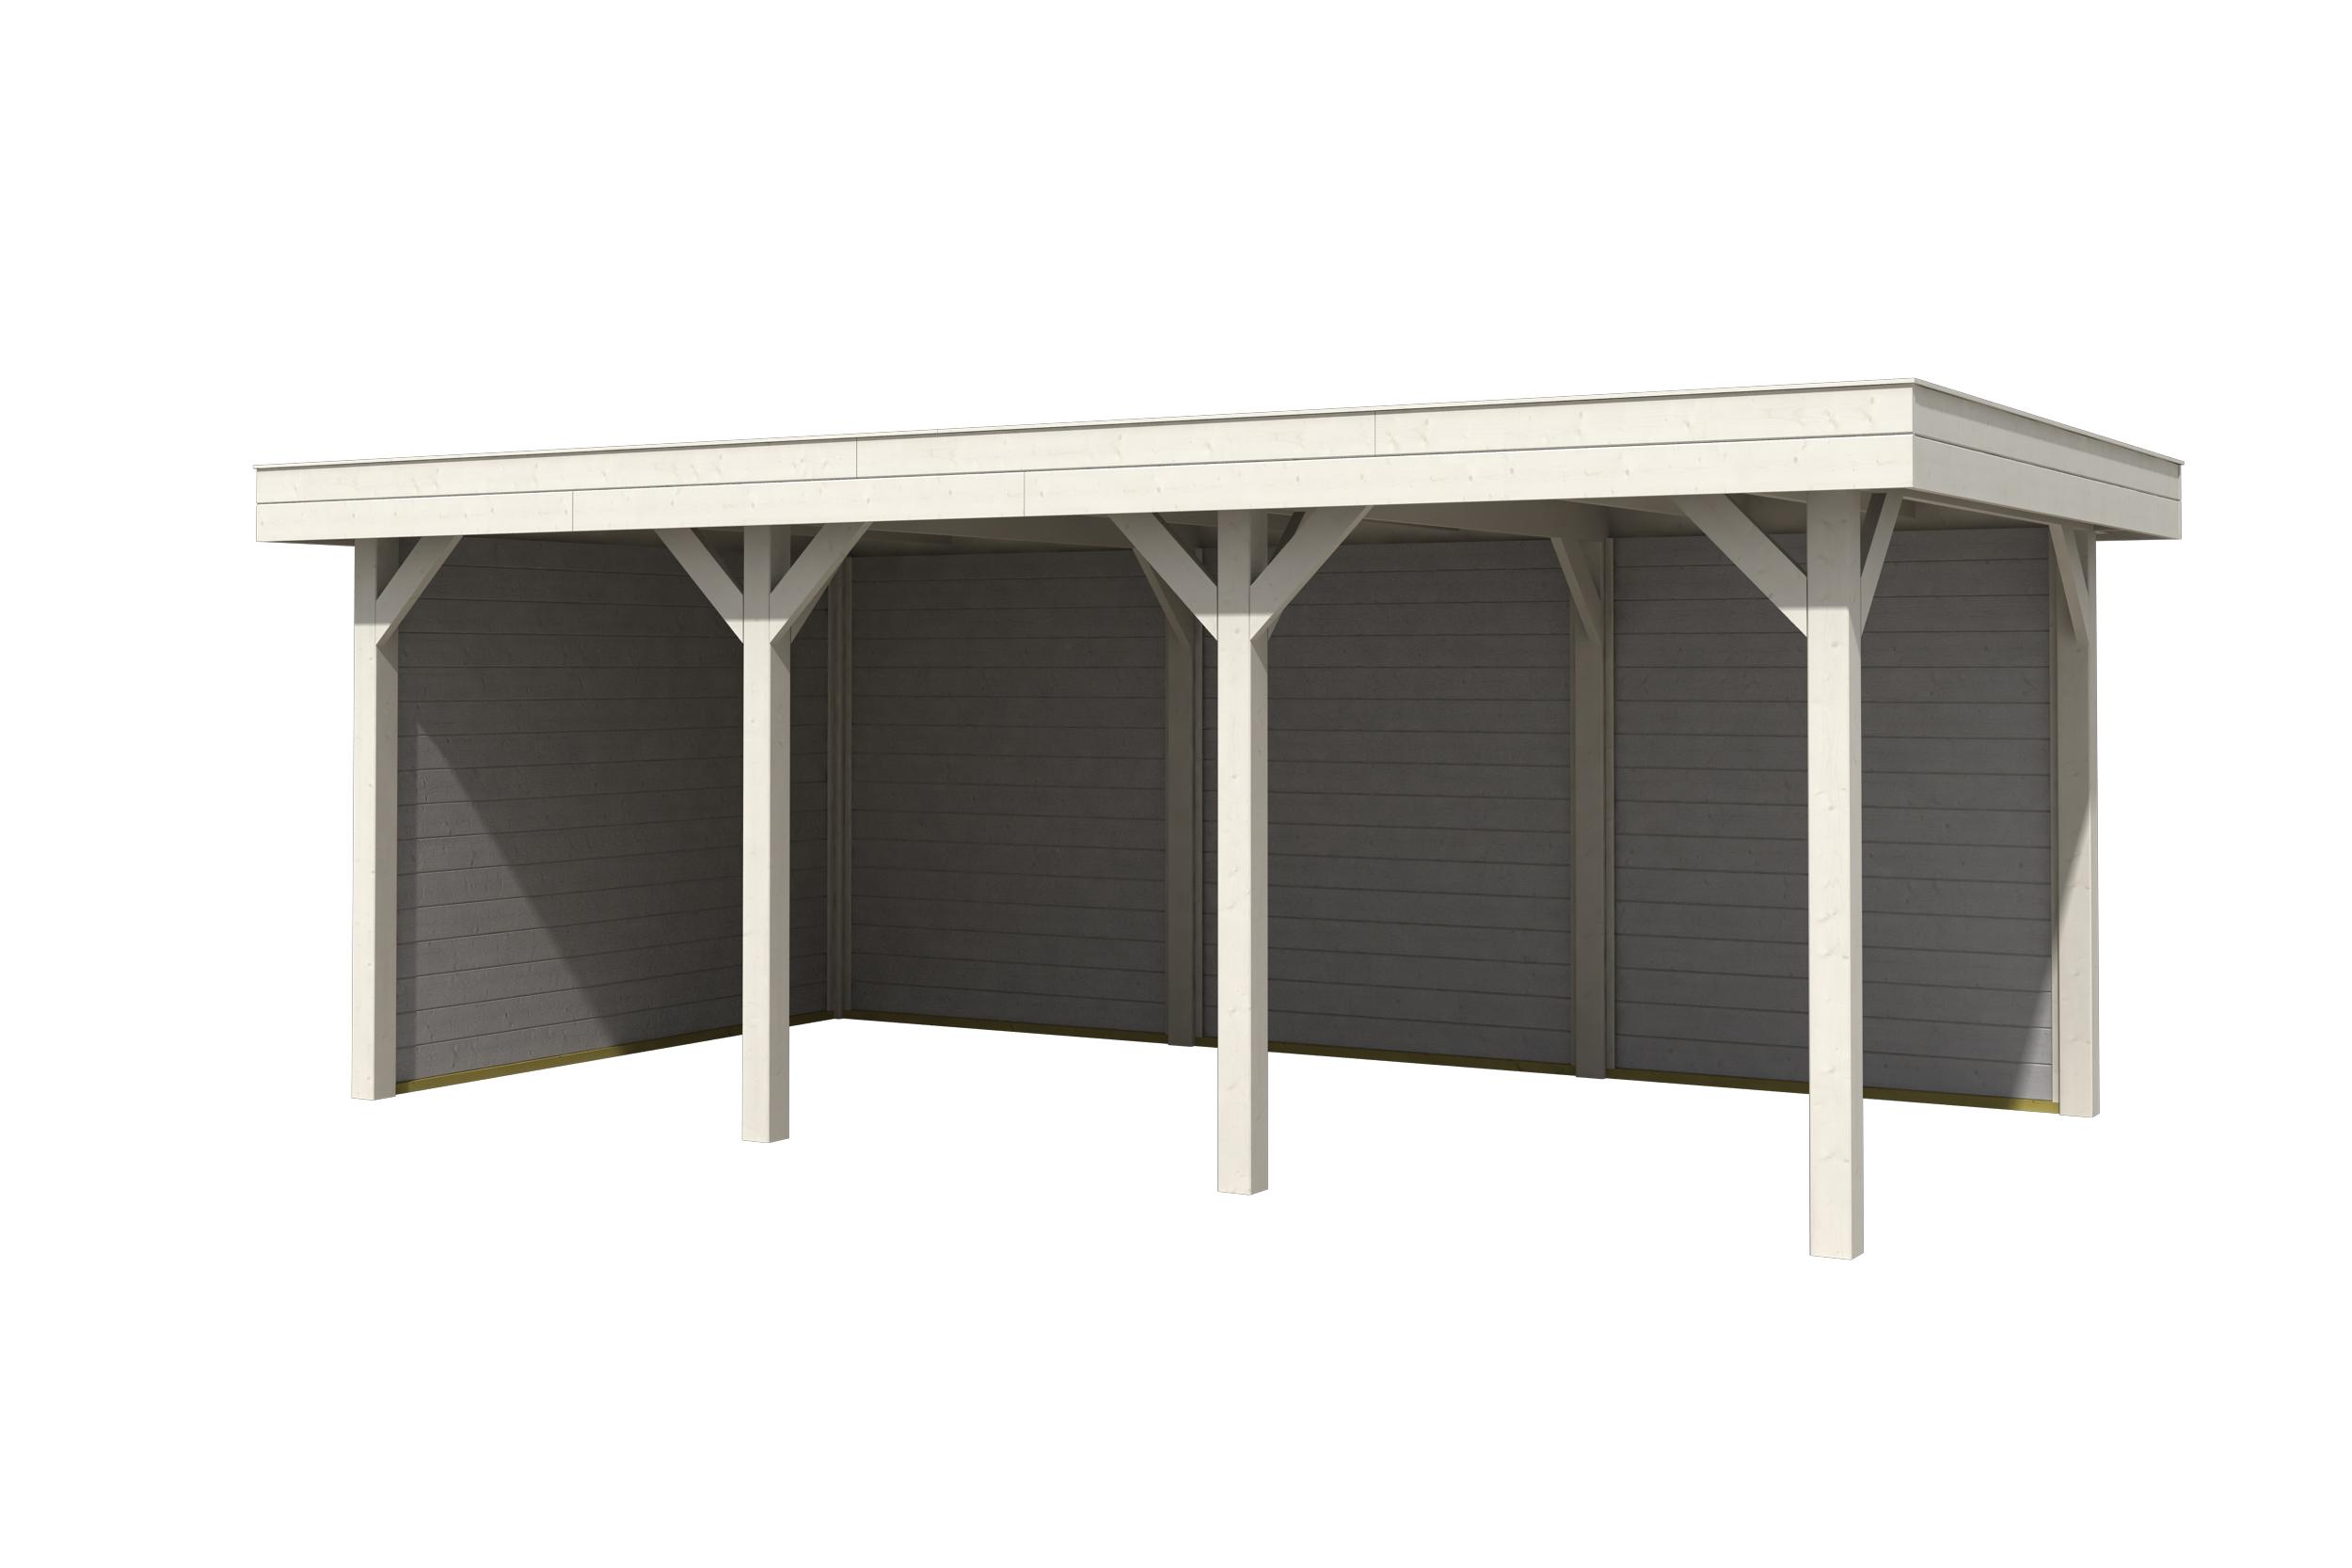 Westwood | Outdoor Living 6030 20 Plus | Platinum Grey | 588x304 cm